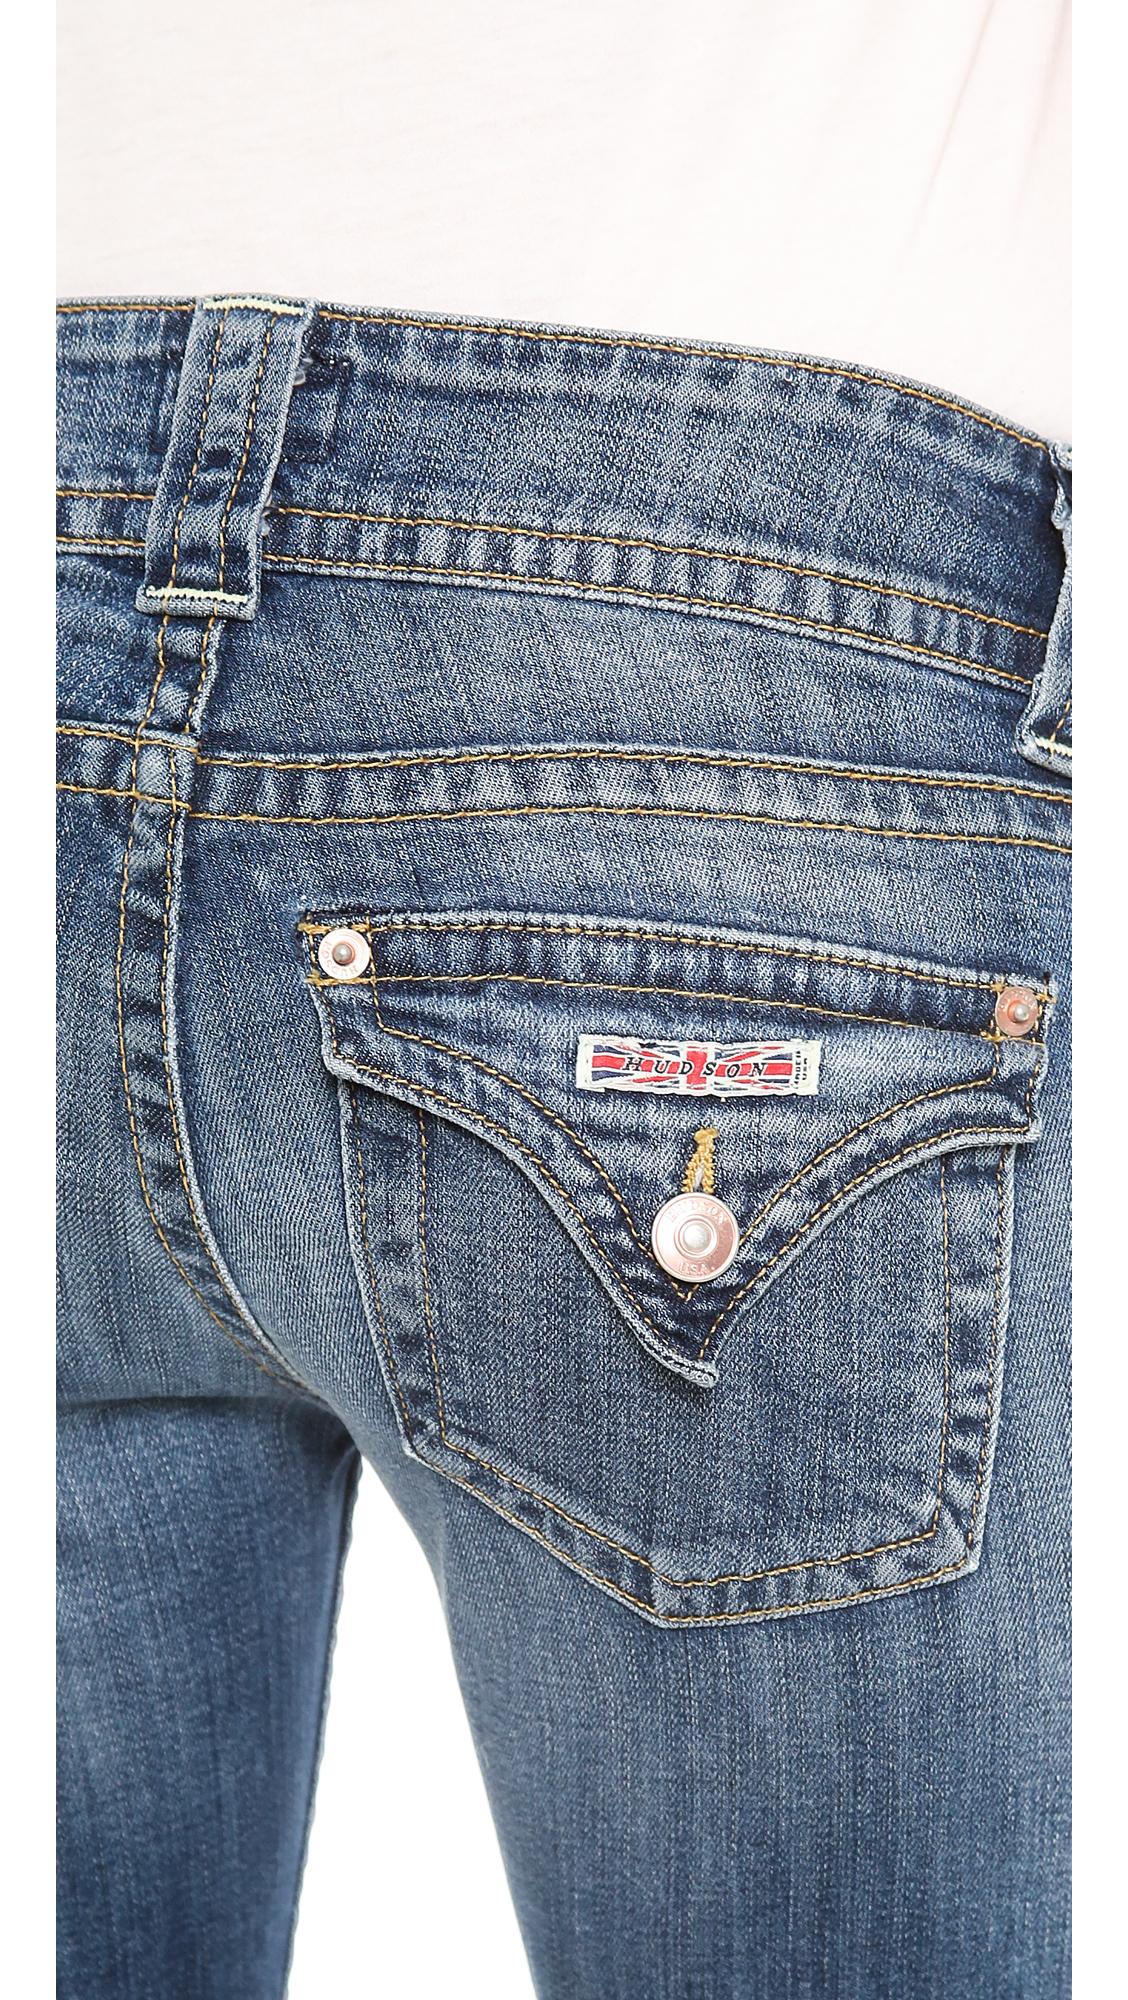 lyst hudson jeans signature bootcut jeans hackney in blue. Black Bedroom Furniture Sets. Home Design Ideas